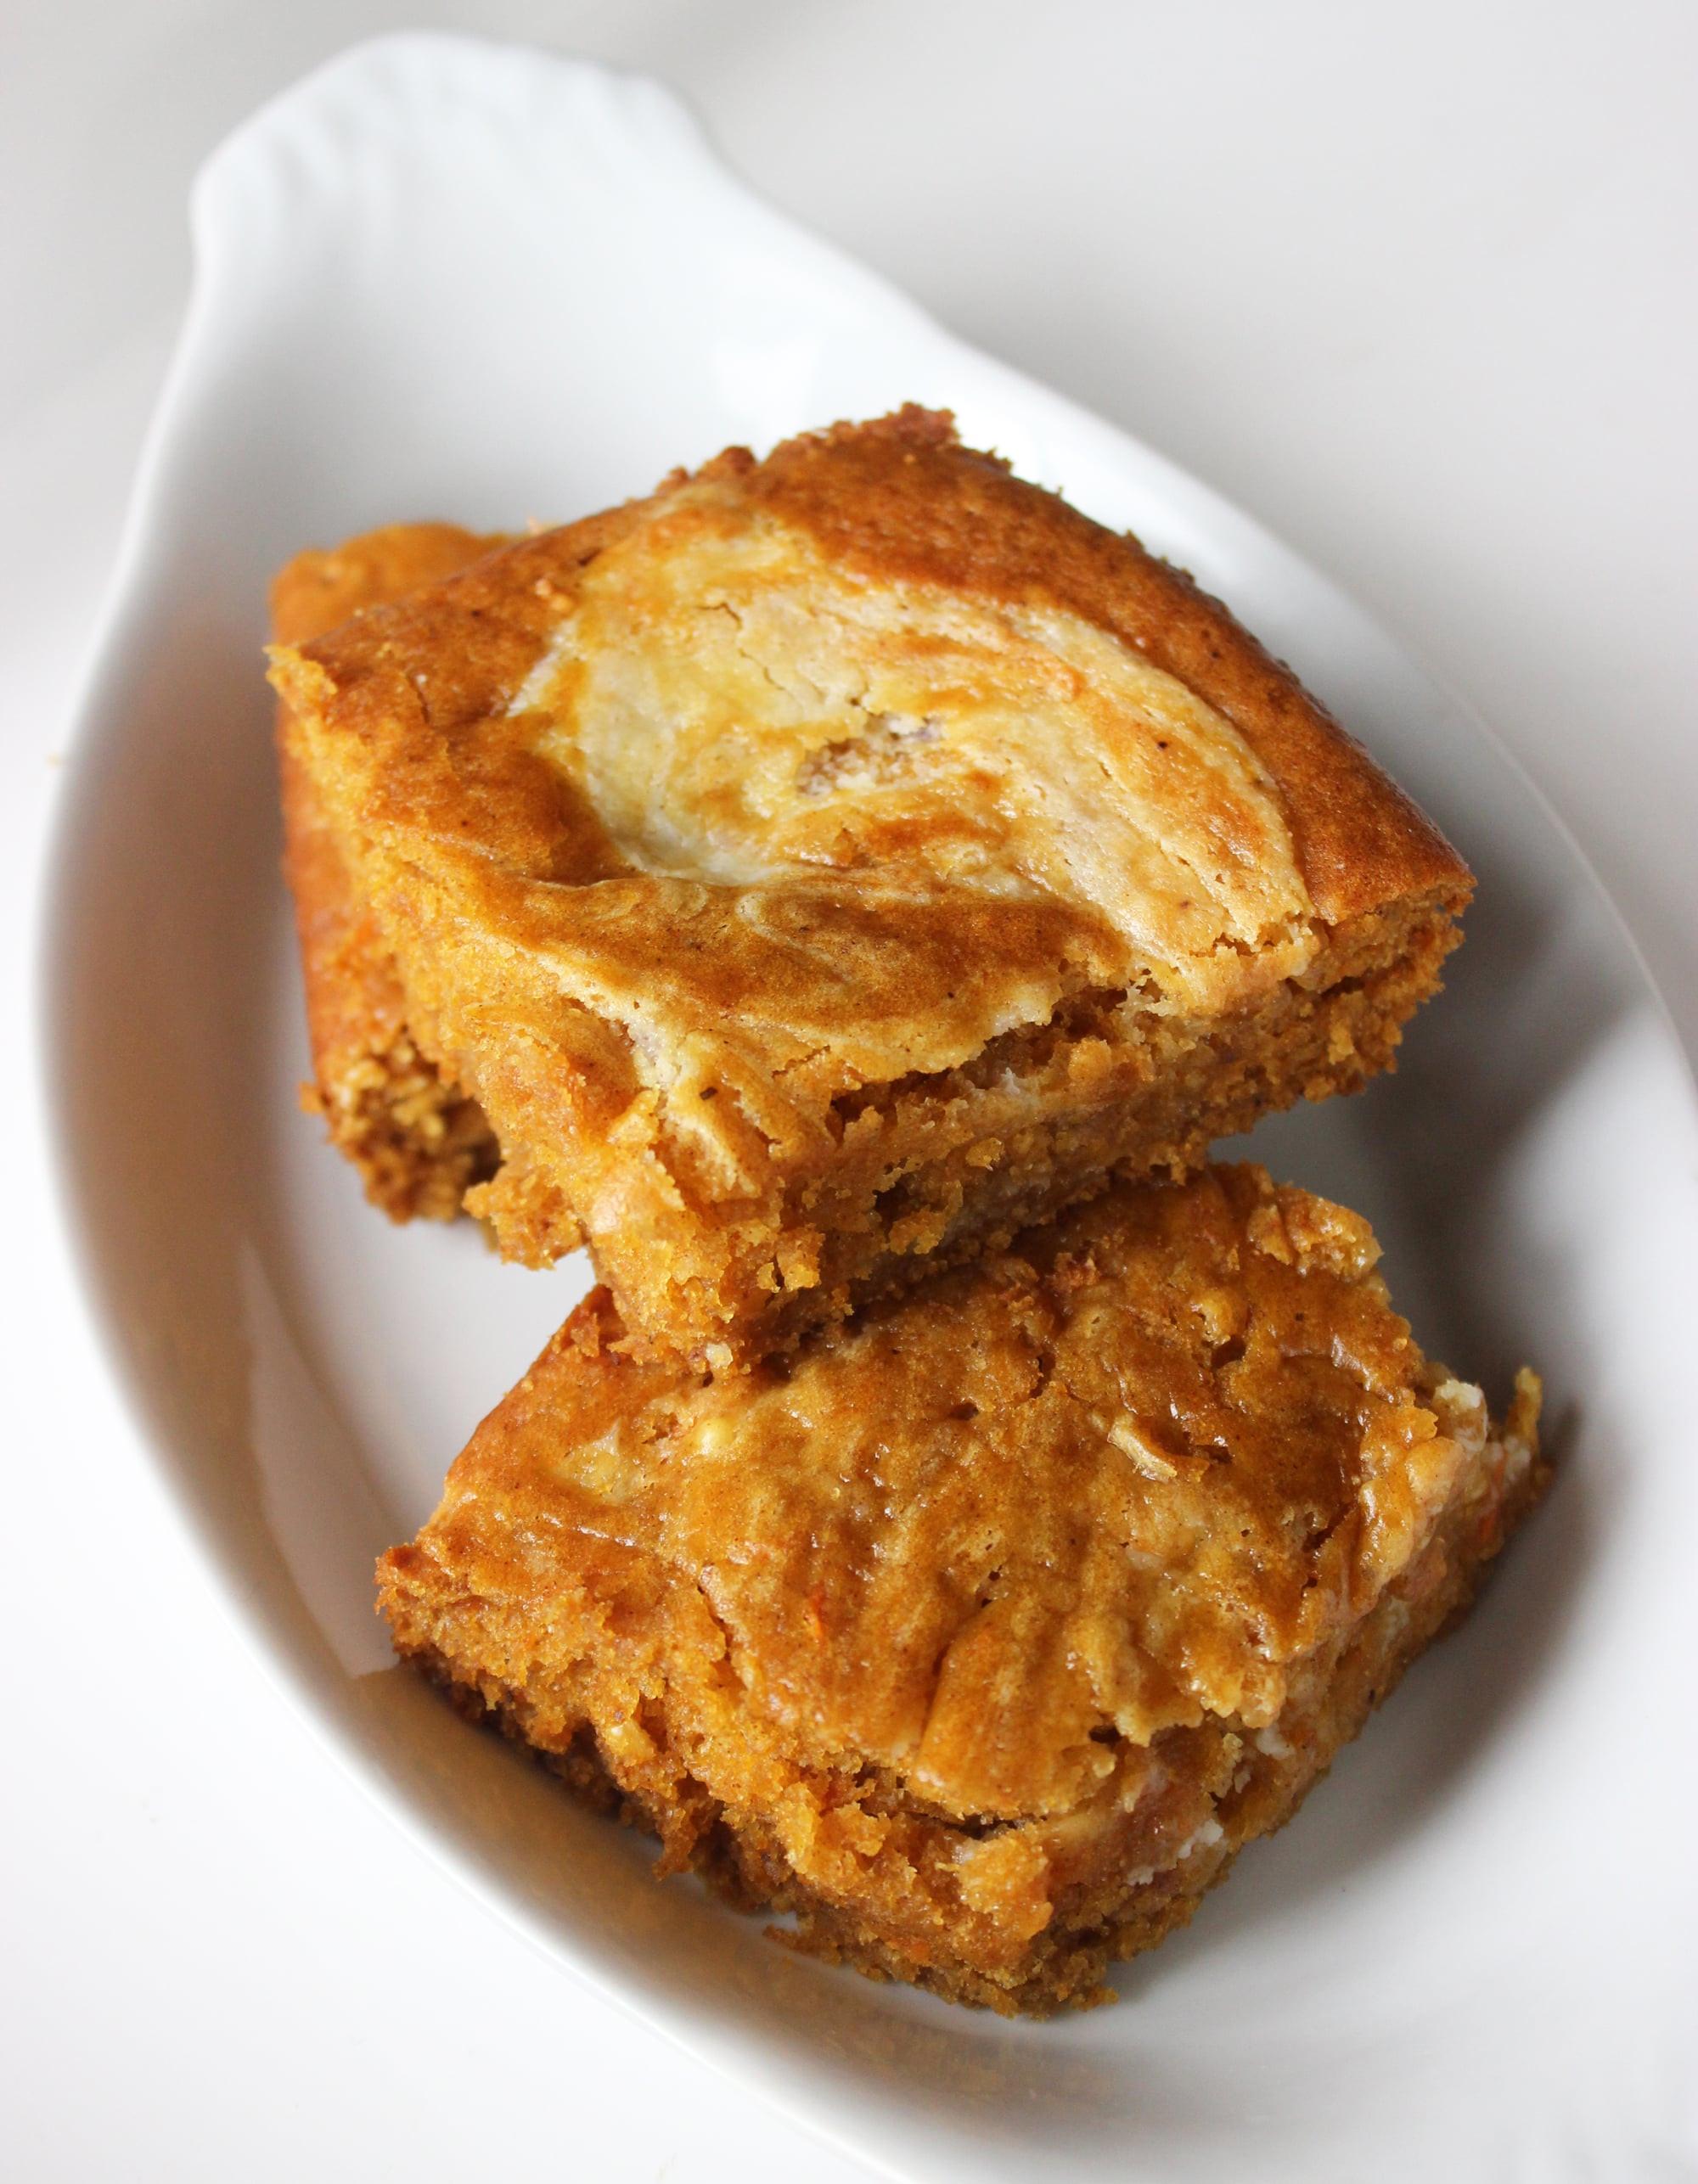 Healthy Canned Pumpkin Dessert Recipes  Healthy Dessert Pumpkin Carrot Bars With Cream Cheese